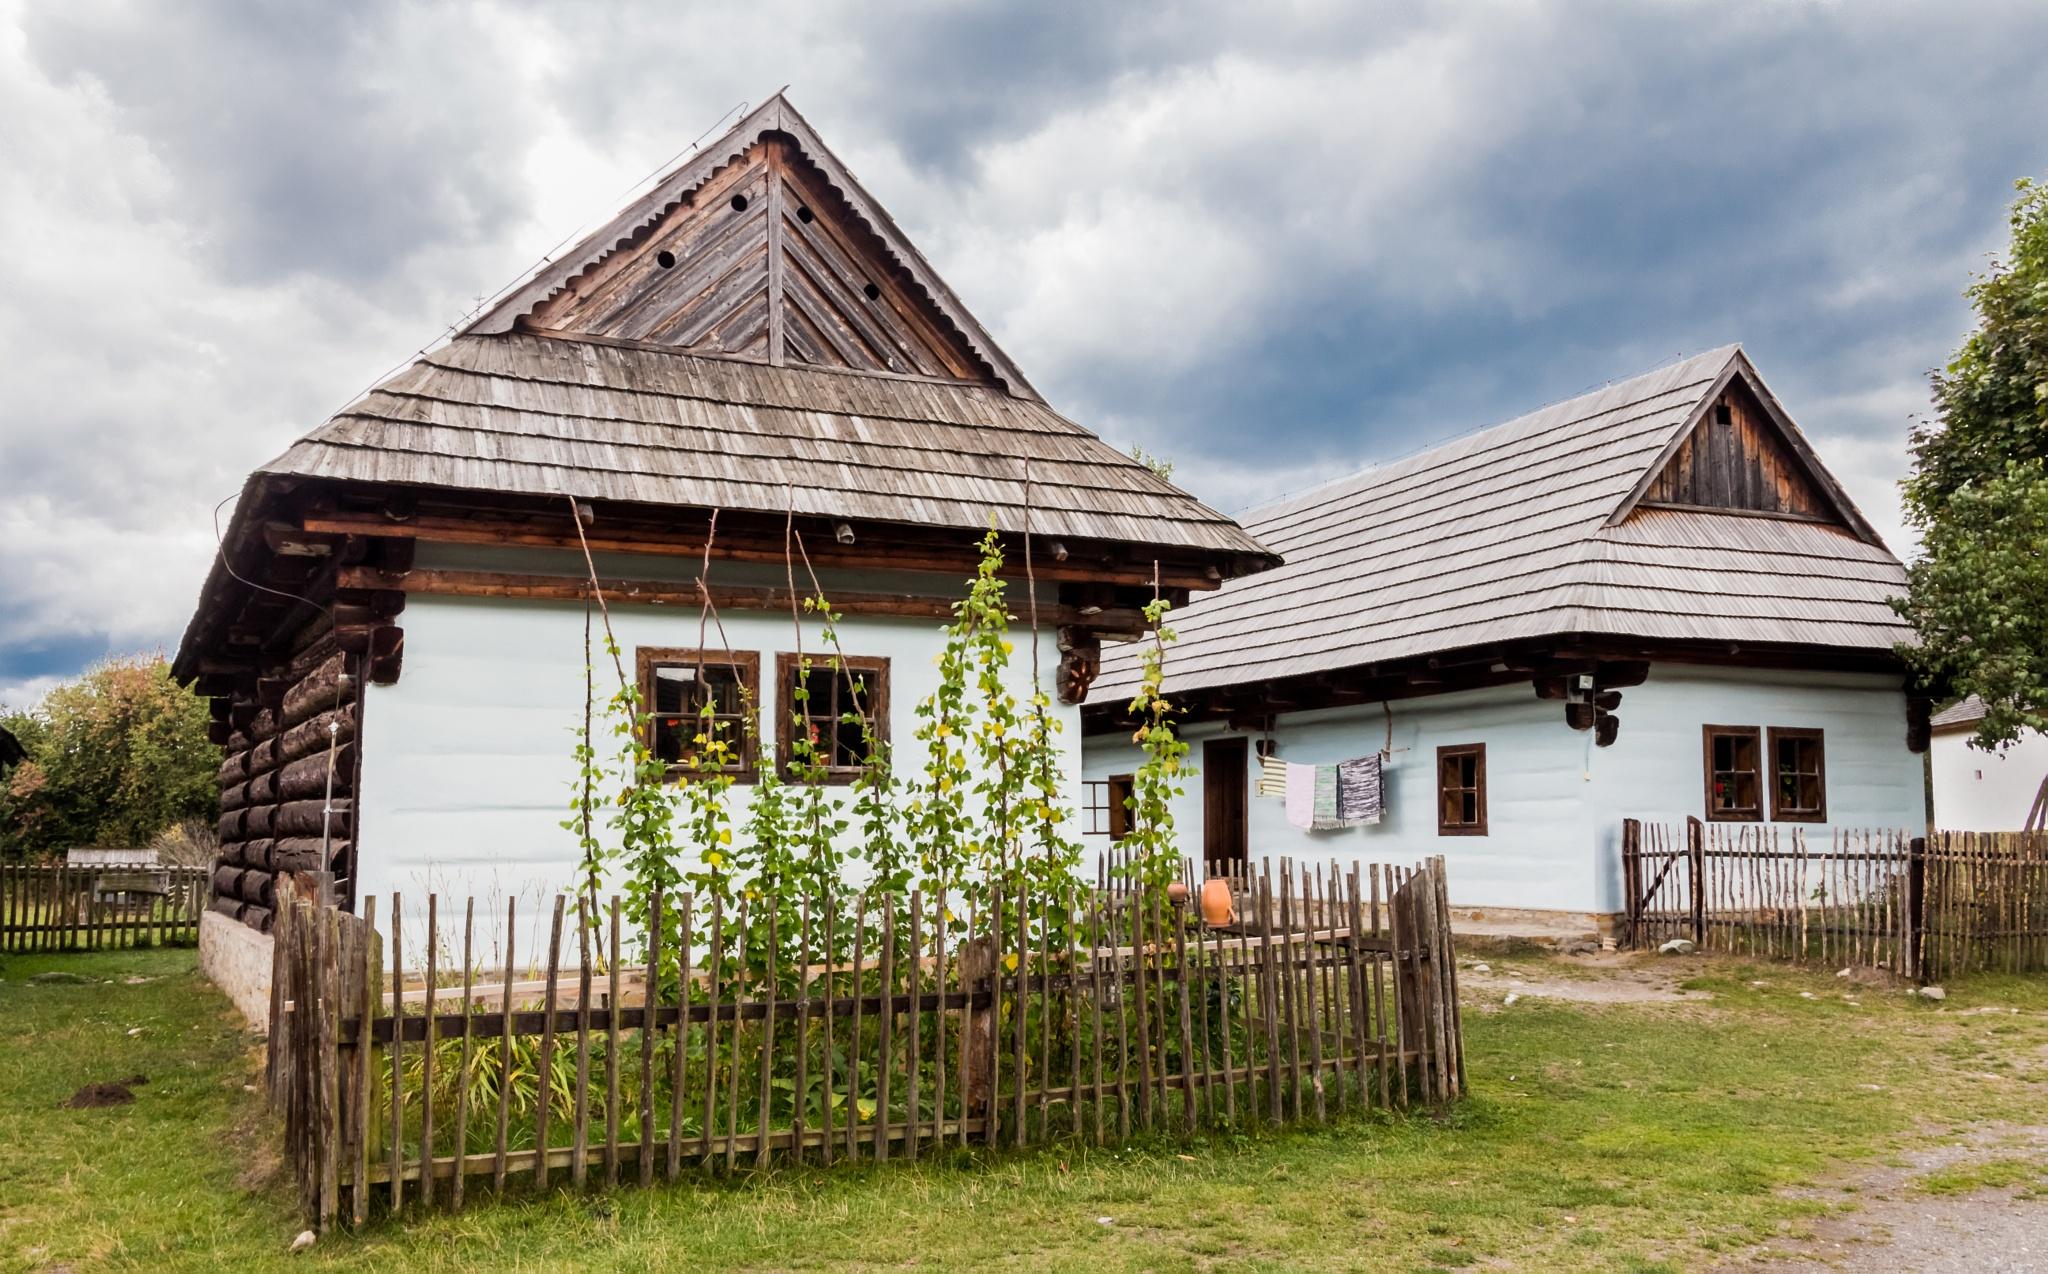 Wooden houses Liptov by Laco Hubaty